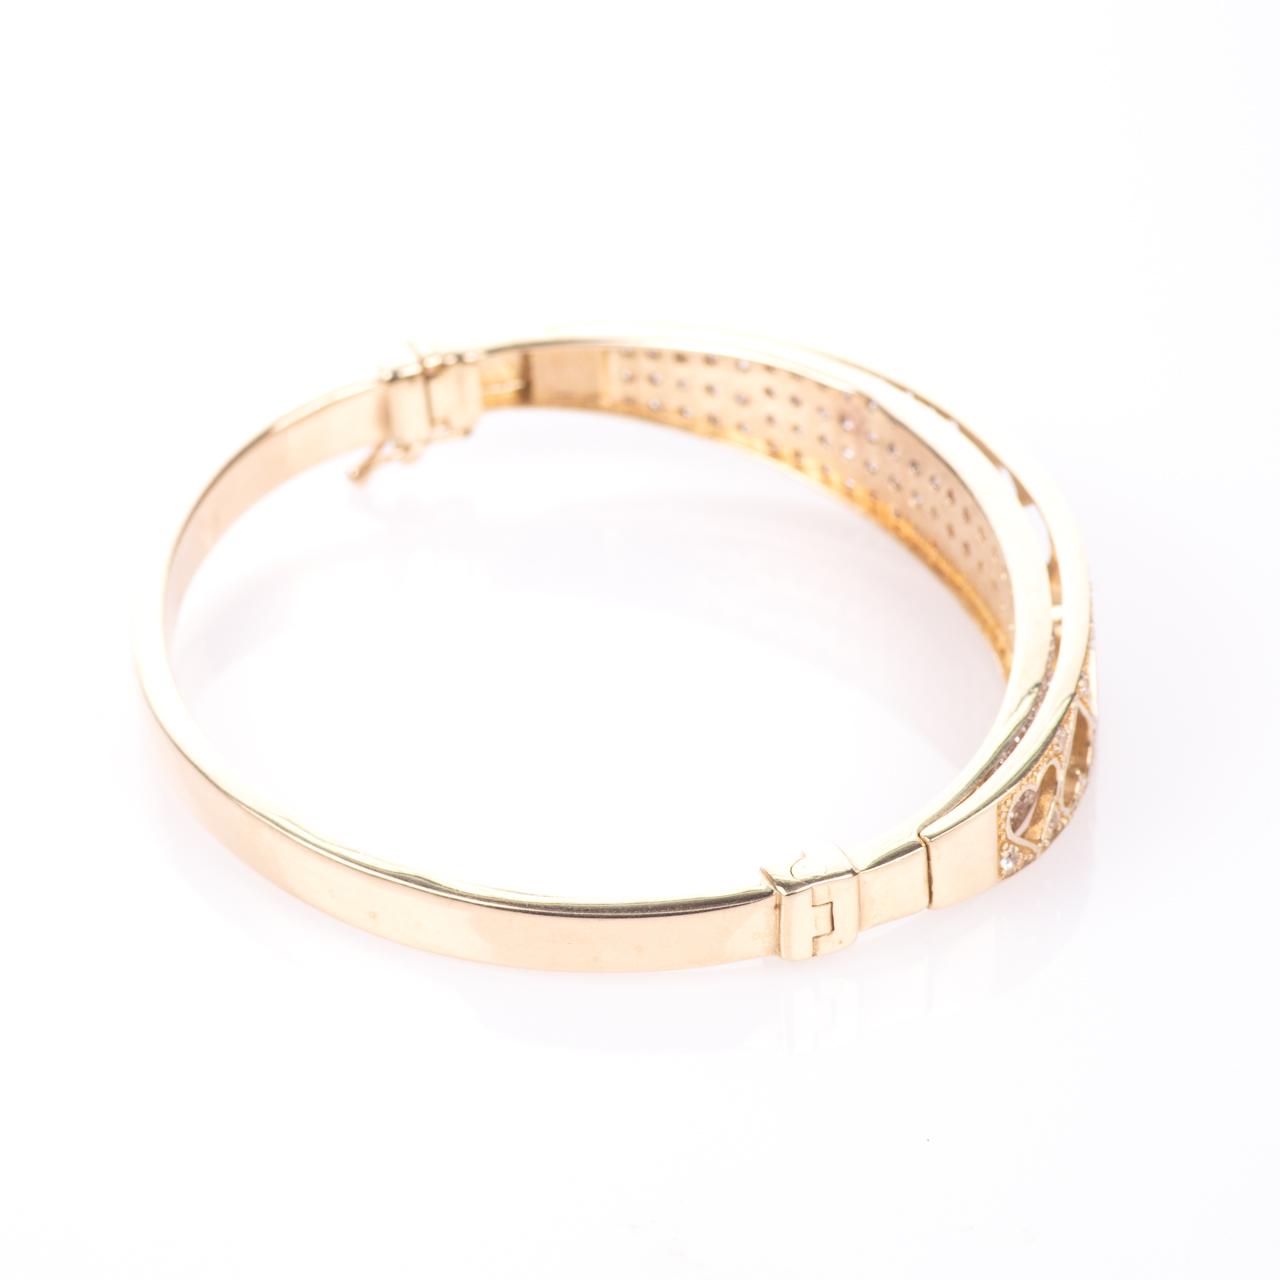 9ct Gold 4ct Diamond Heart Bangle Bracelet - Image 7 of 7